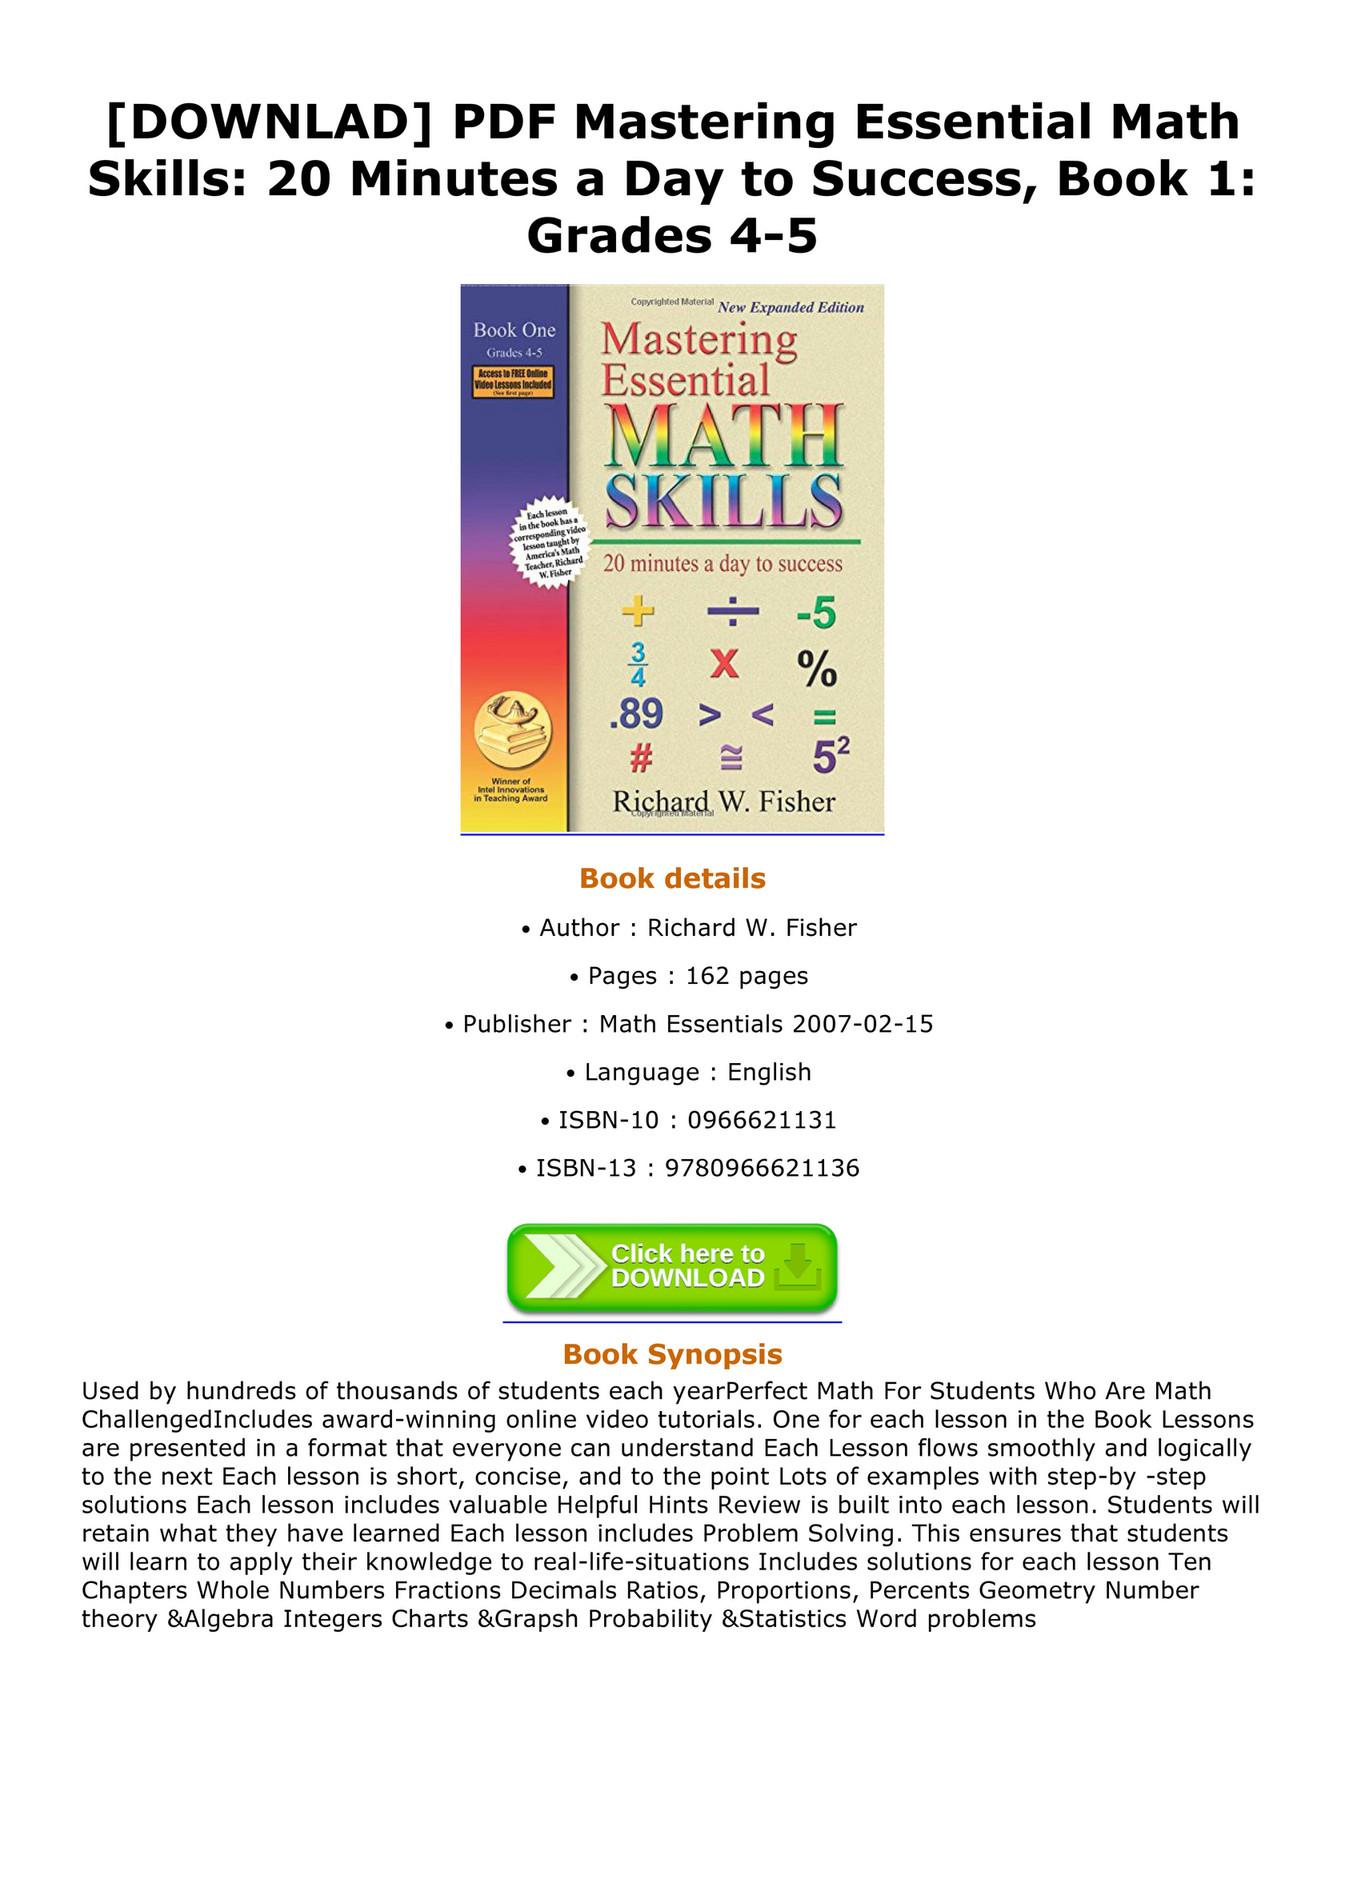 Cavalieri - DOWNLAD PDF Mastering Essential Math Skills 20 Minutes a